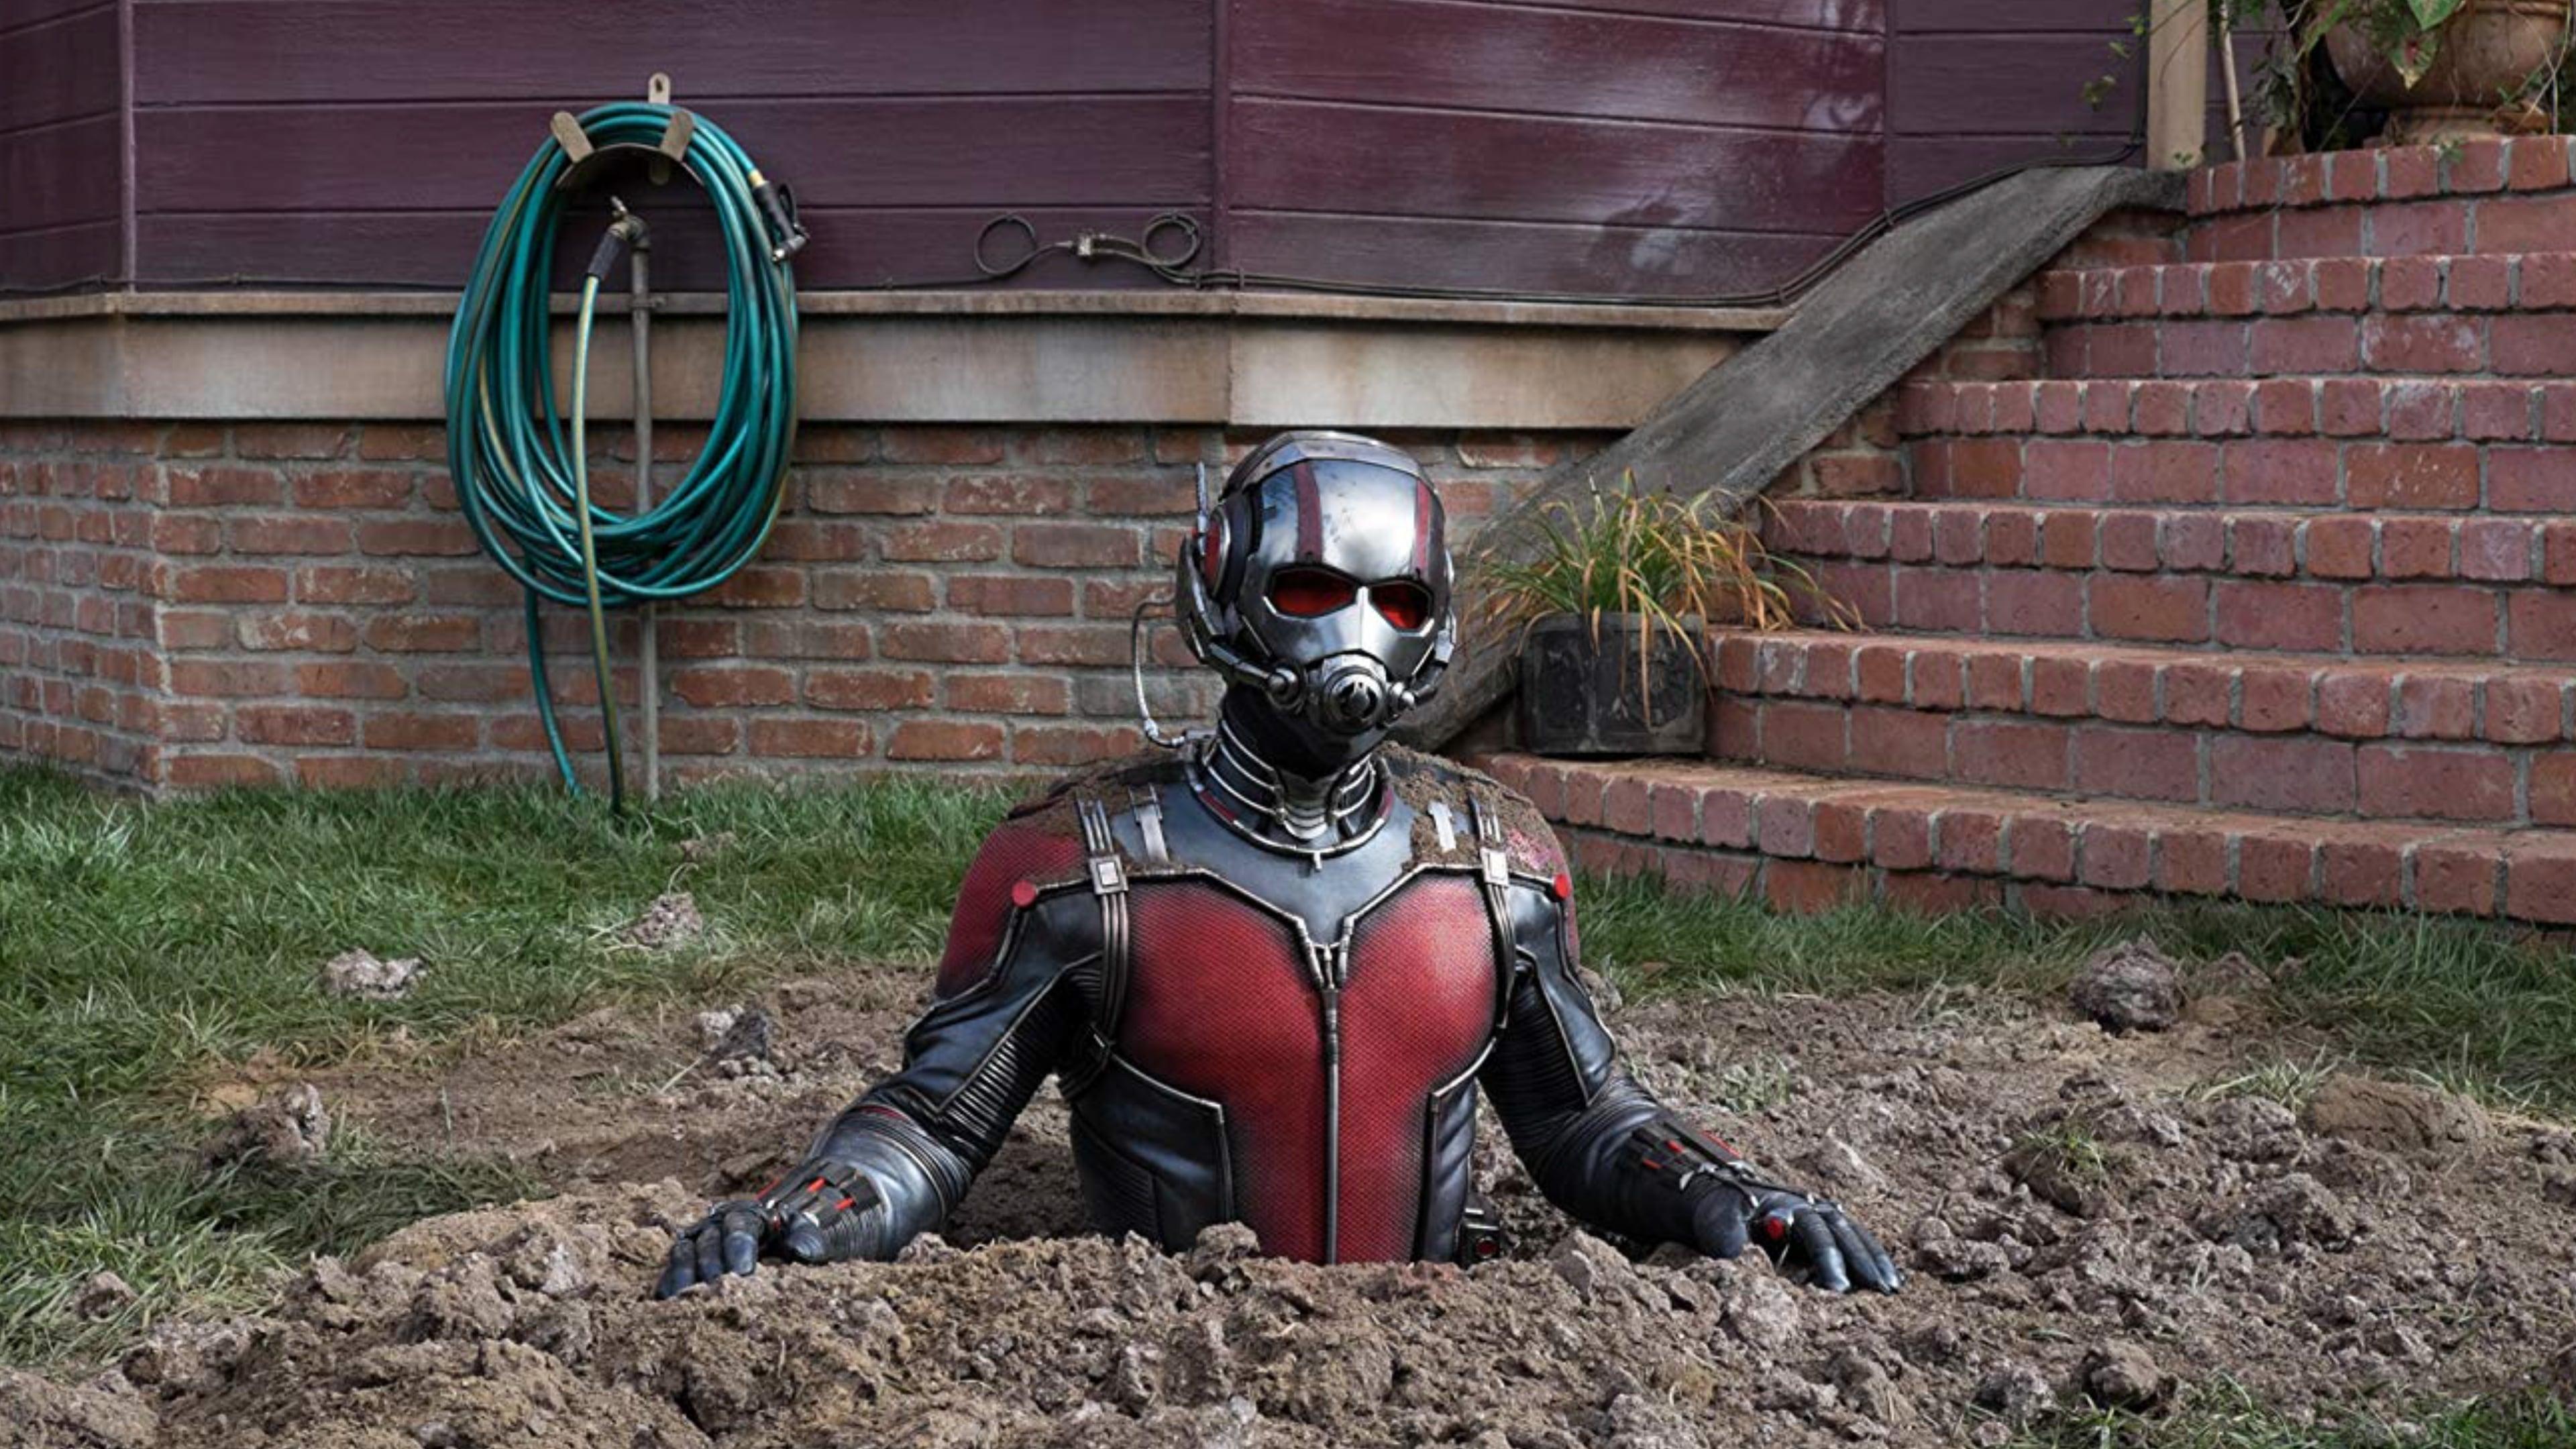 Photo extraite de Ant-Man